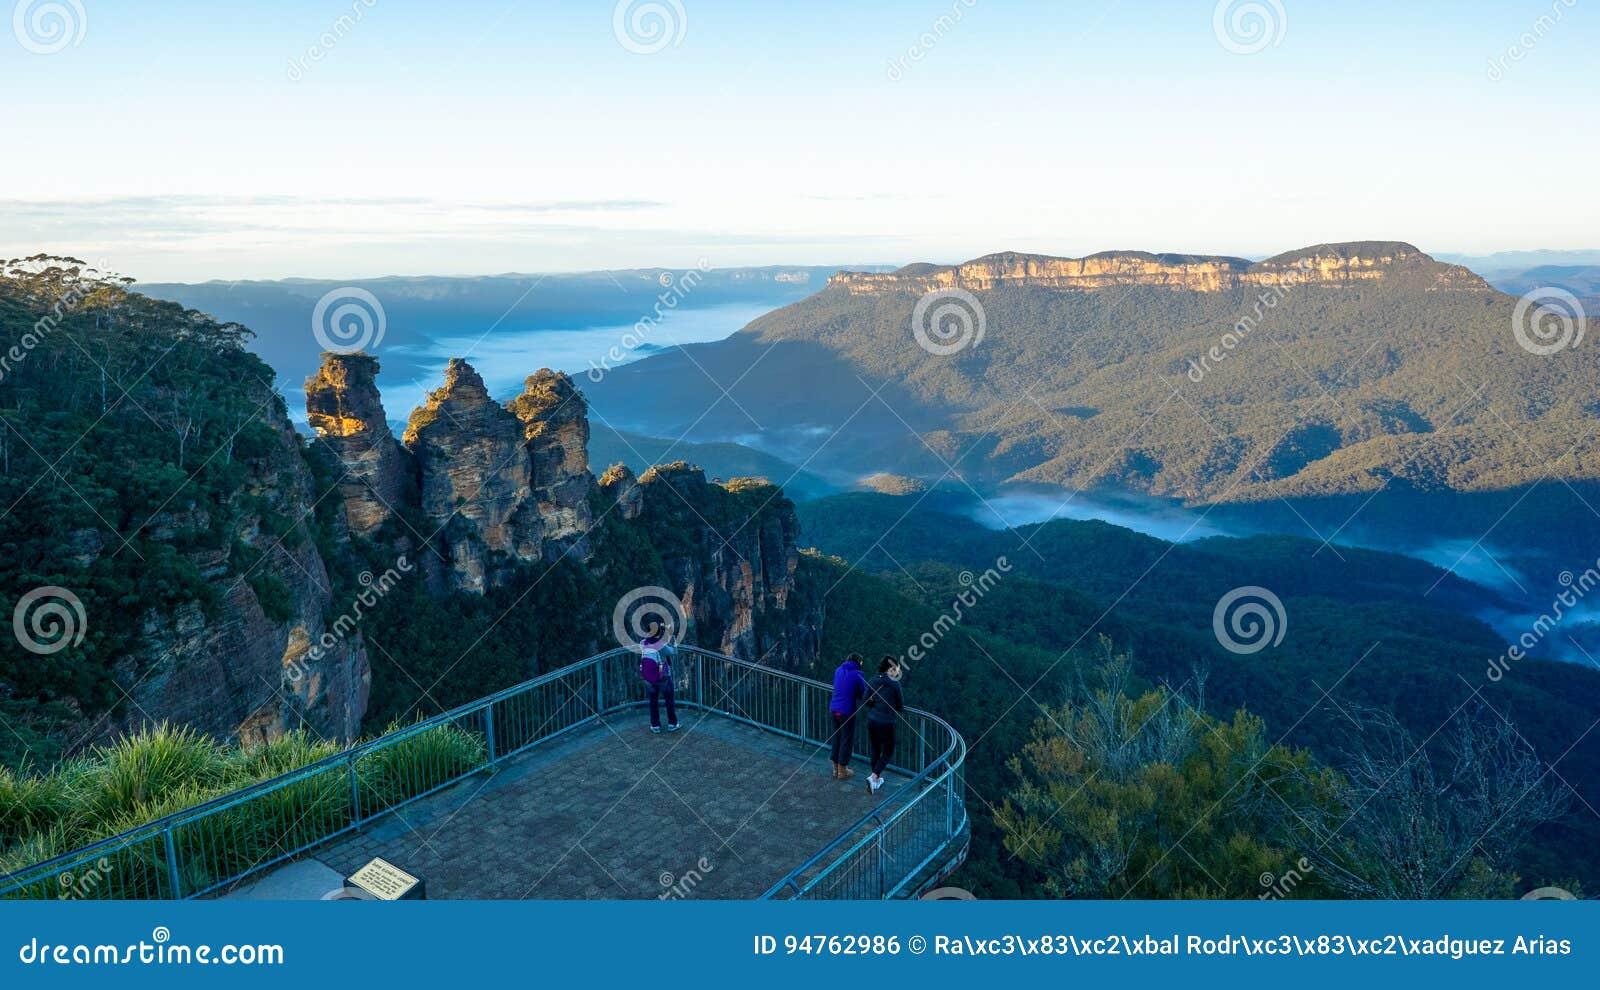 Widok góra Odludna i Trzy siostry, Błękitny góry pasmo górskie, Australia